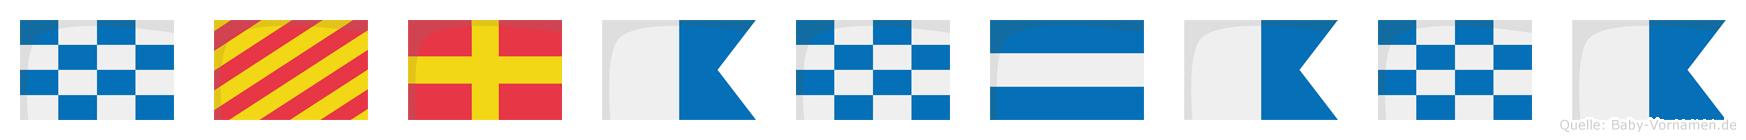 Nyranjana im Flaggenalphabet